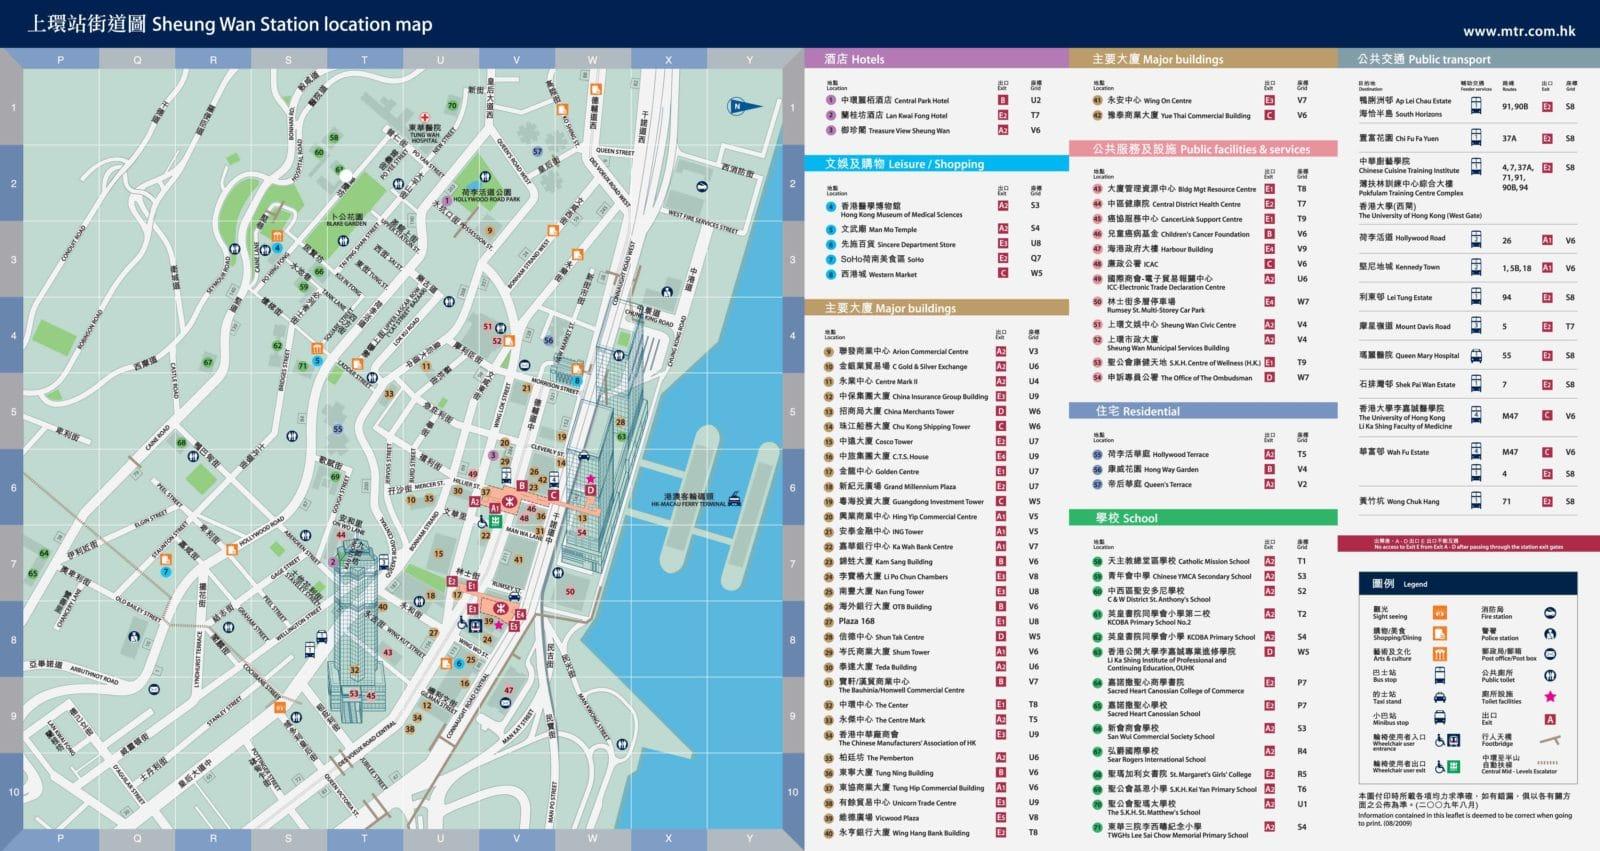 Hong Kong: Sheung Wan MTR station area map 2012-2013